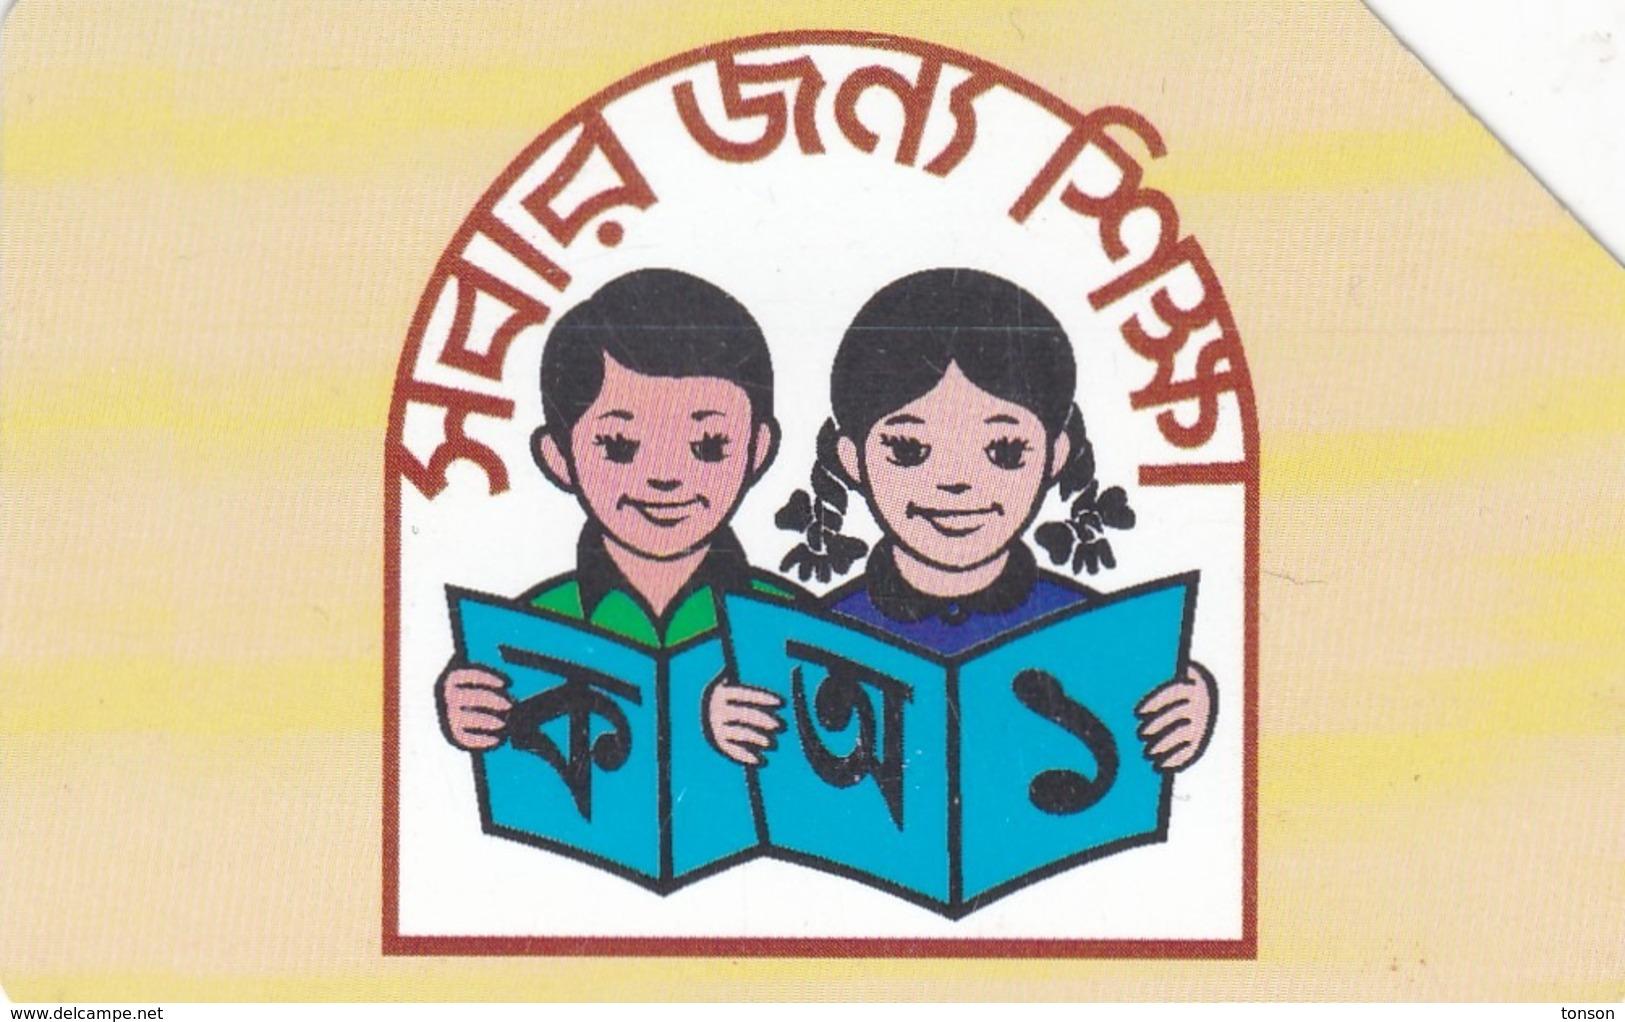 Bangladesh, BD-TSS-URM-0004C, 50 Units , Children Reading A Book (Thin Band - Text On 3 Lines), 2 Scans. - Bangladesh